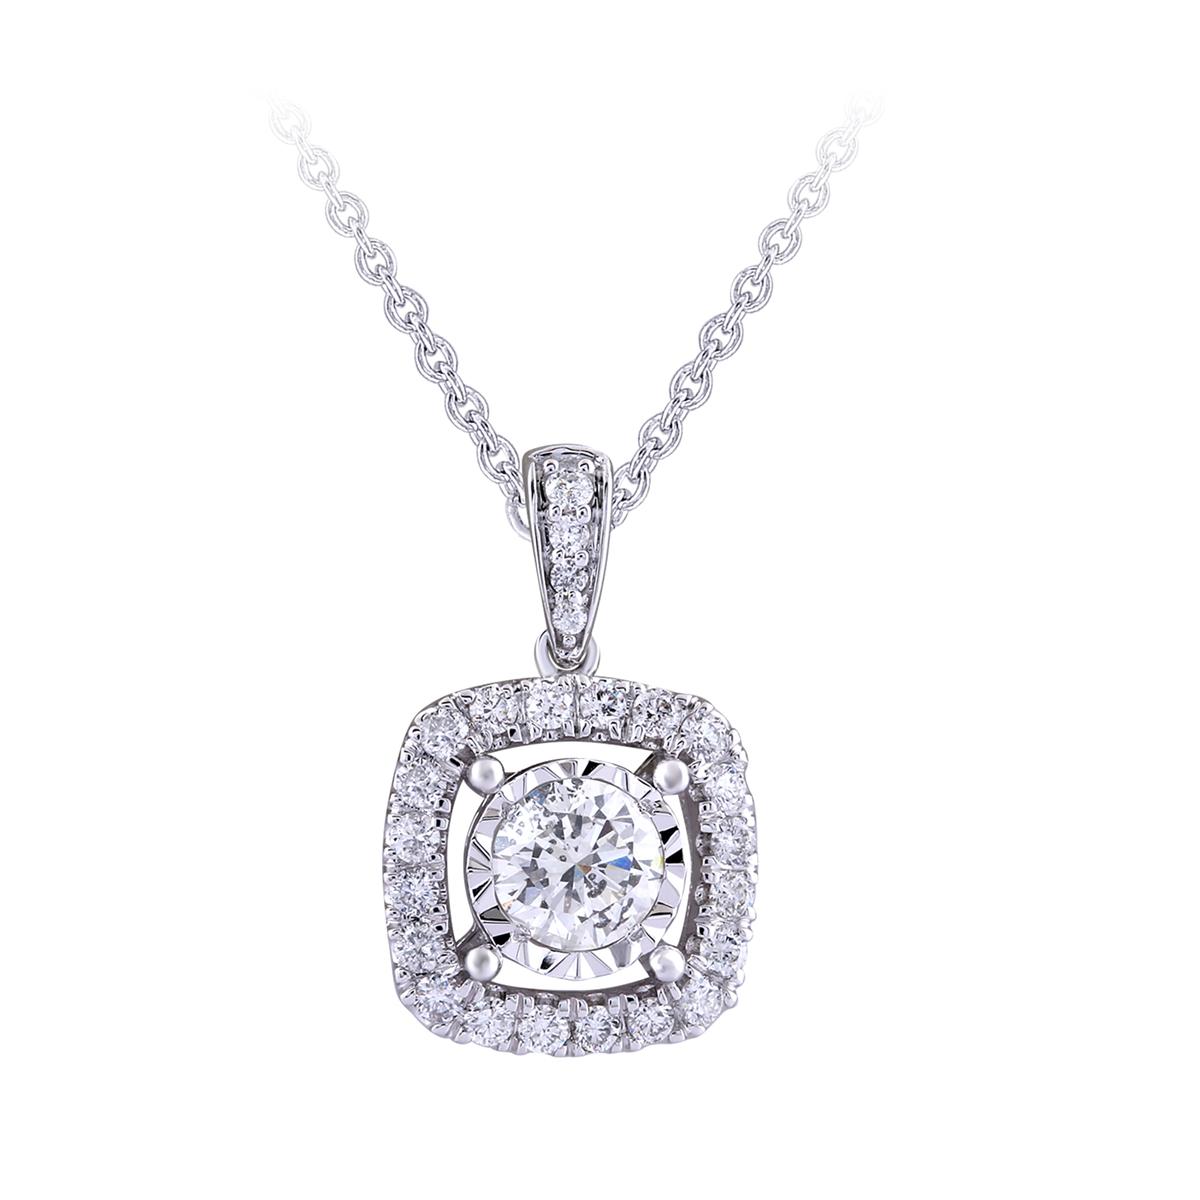 Paramount Gems 14 Karat White Gold Round .5 Carat Diamond Halo Pendant Necklace